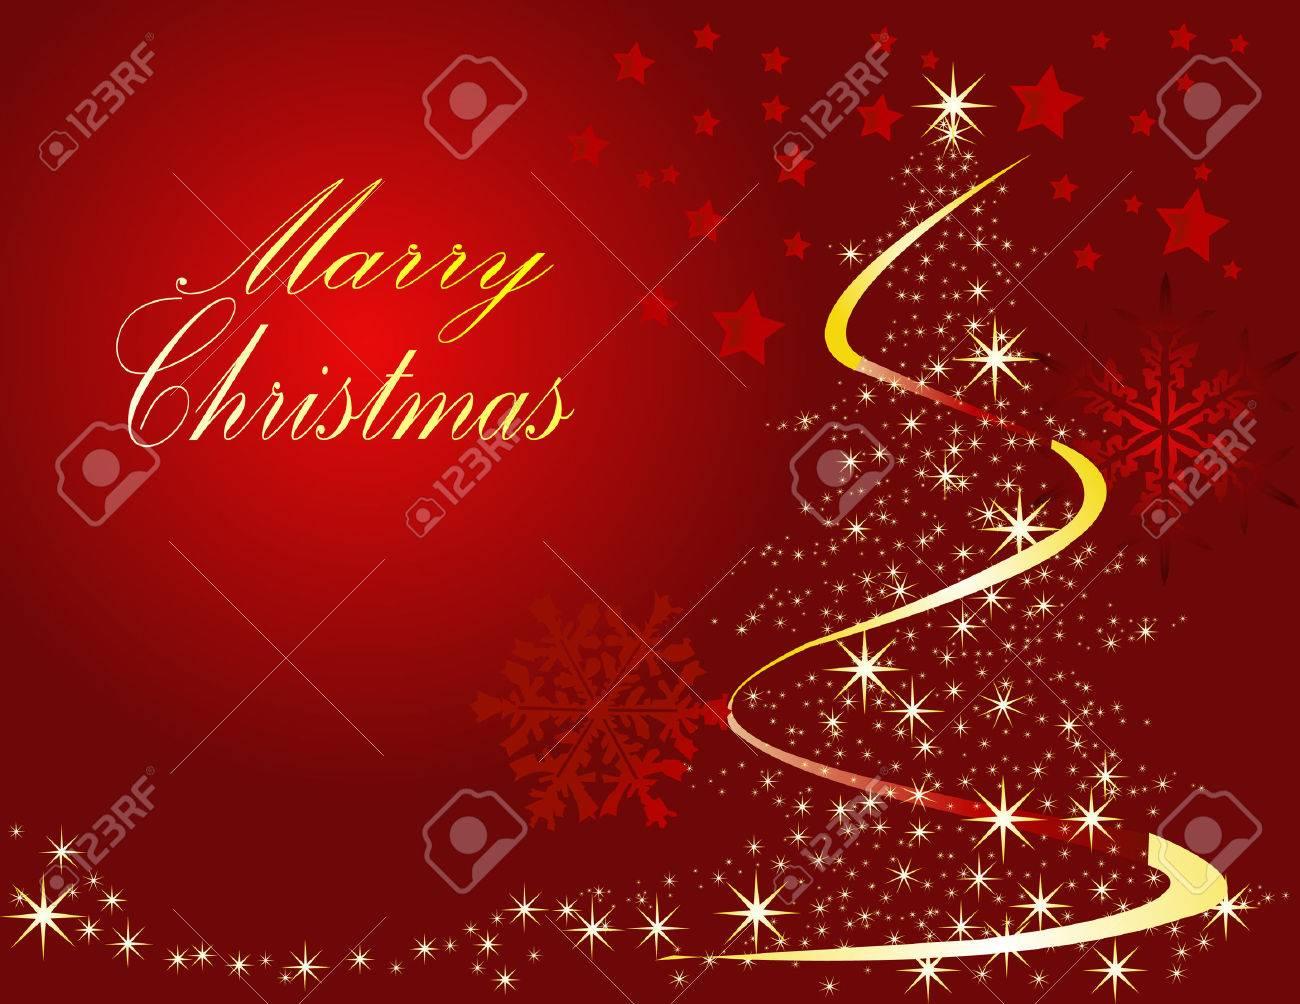 Marry Christmas Stock Vector - 3873974